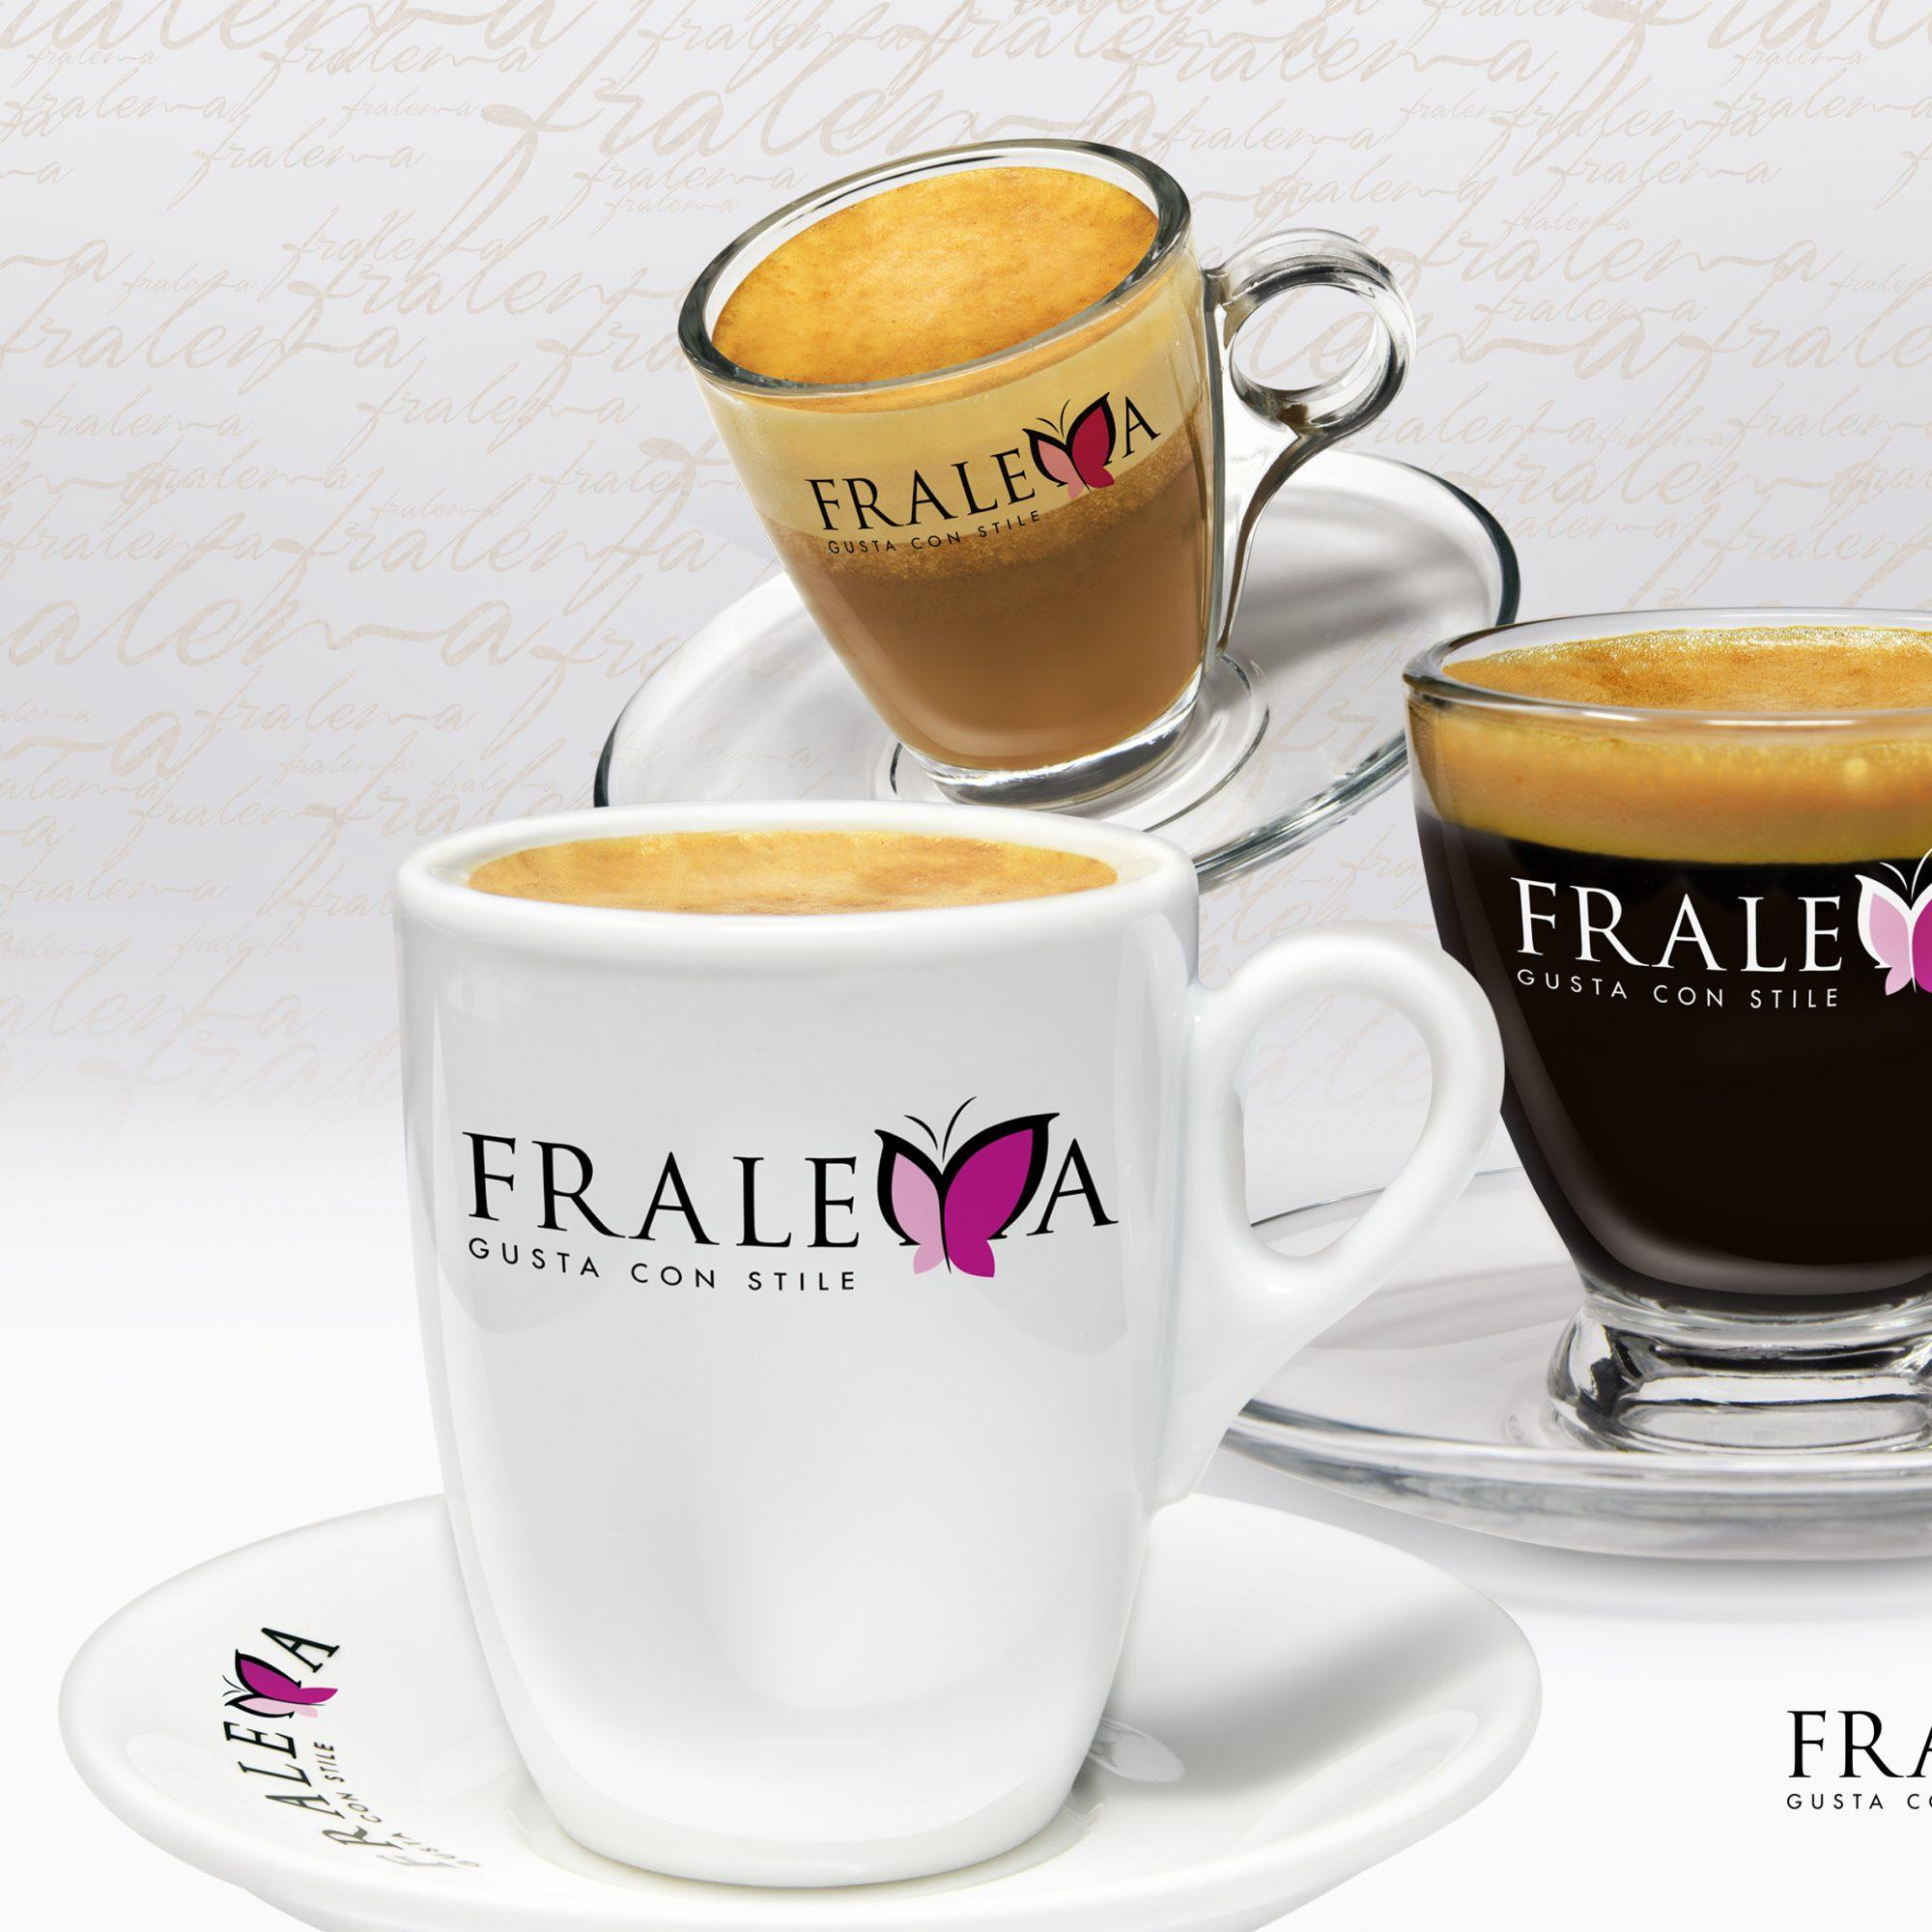 fralema_prodotti per la caffetteria_i caldi_ginseng_ginseng amaro_orzo